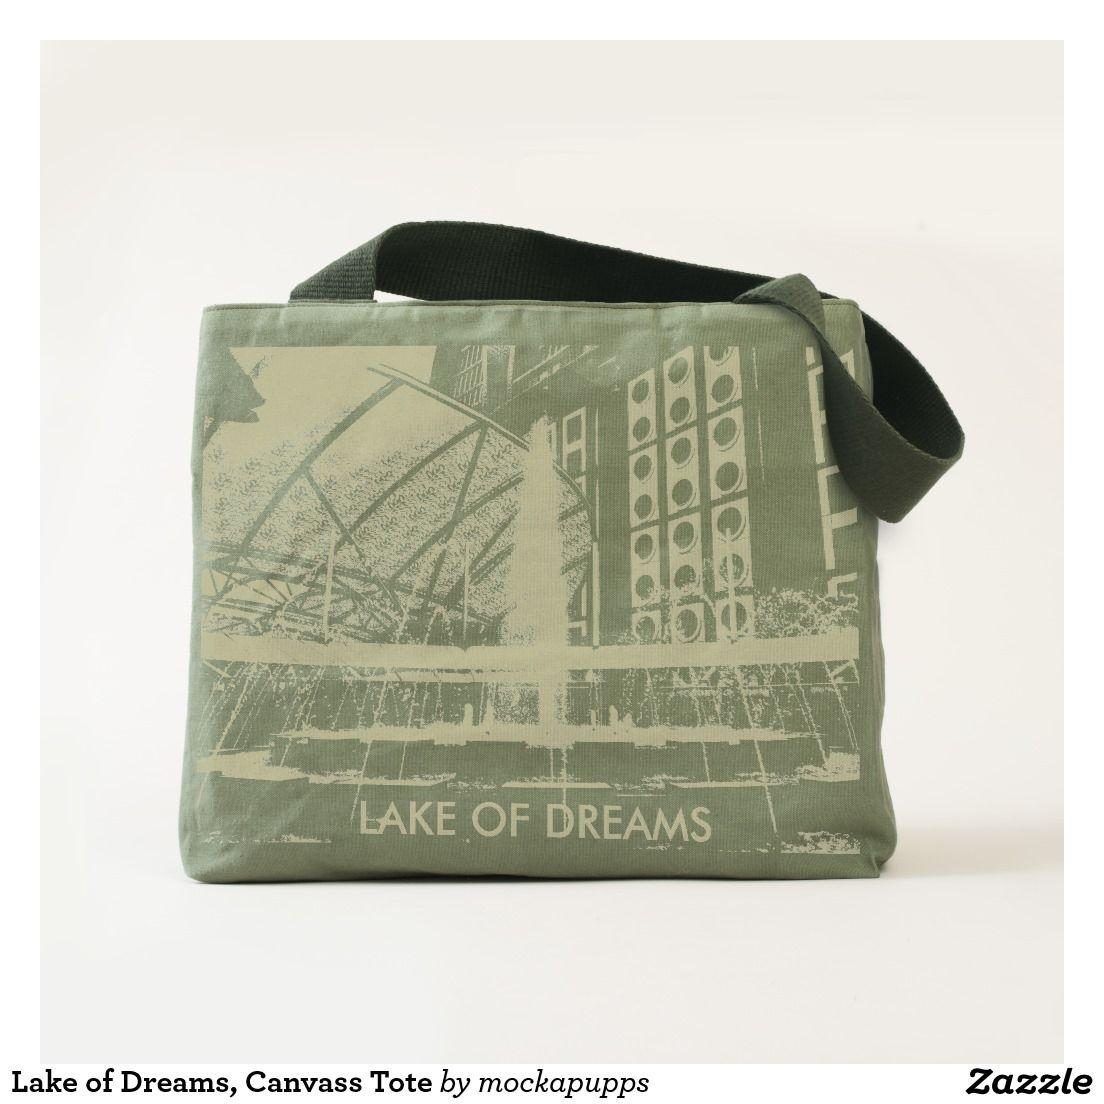 Lake of Dreams, Canvass Tote